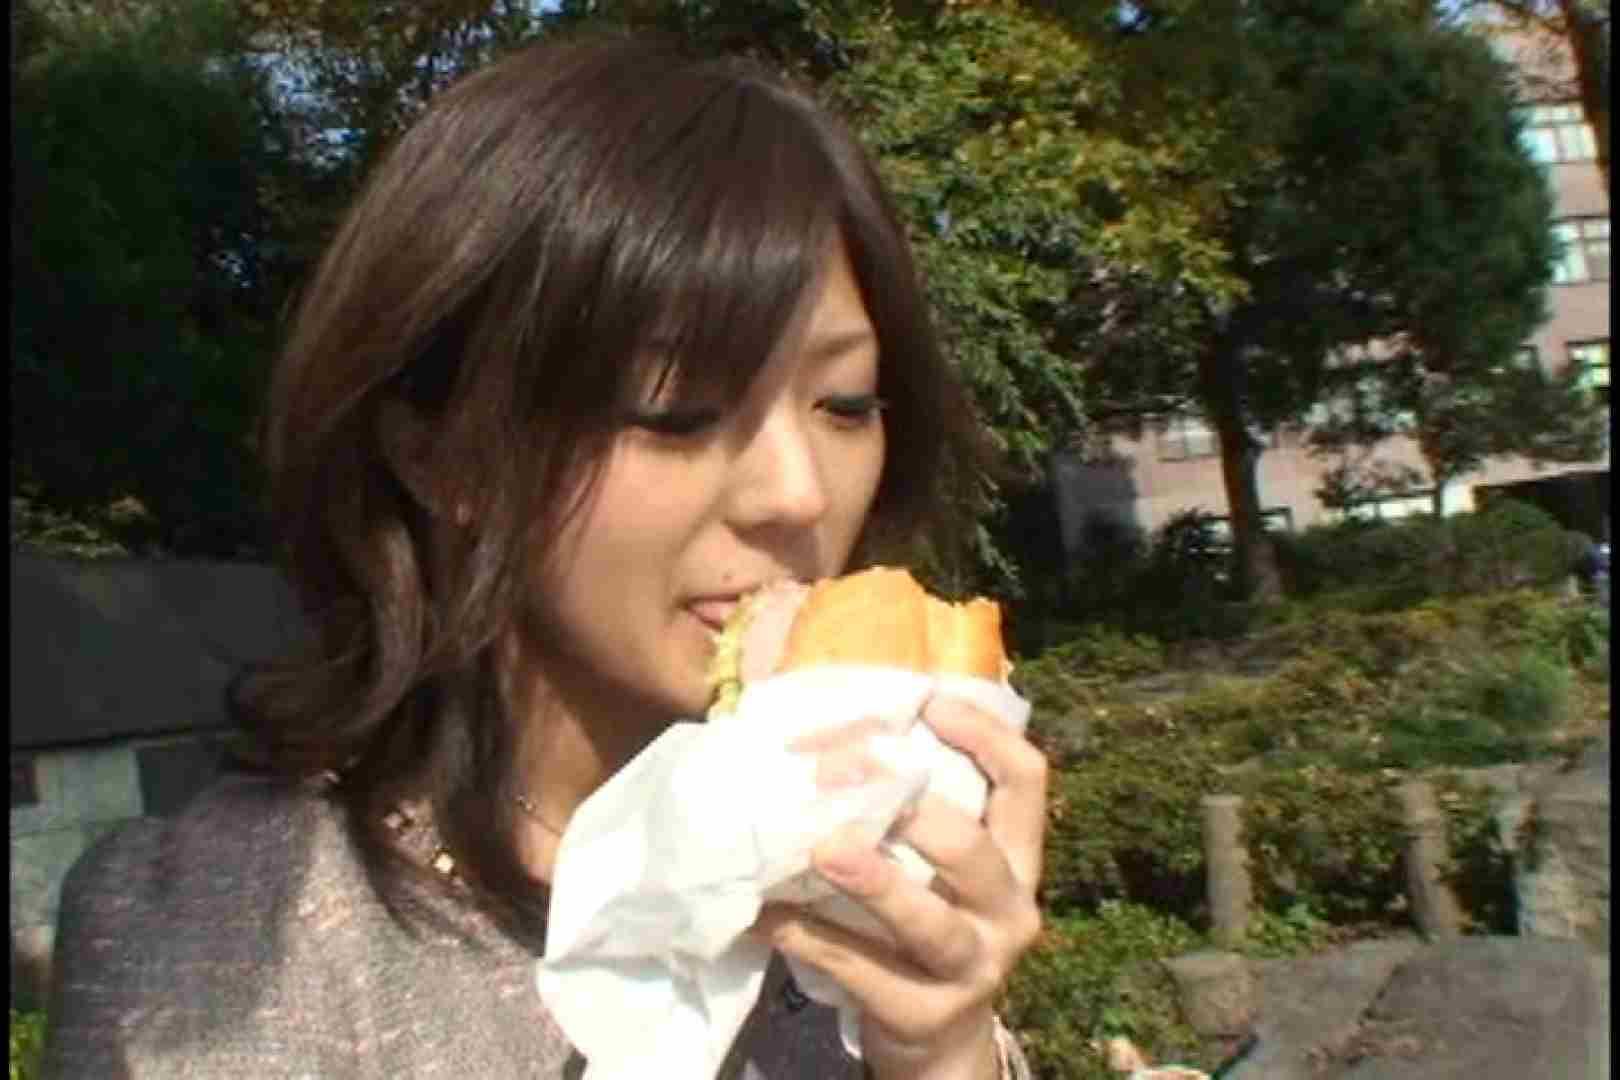 JDハンター全国ツアー vol.035 前編 女子大生のエロ動画 | 0  110PIX 37